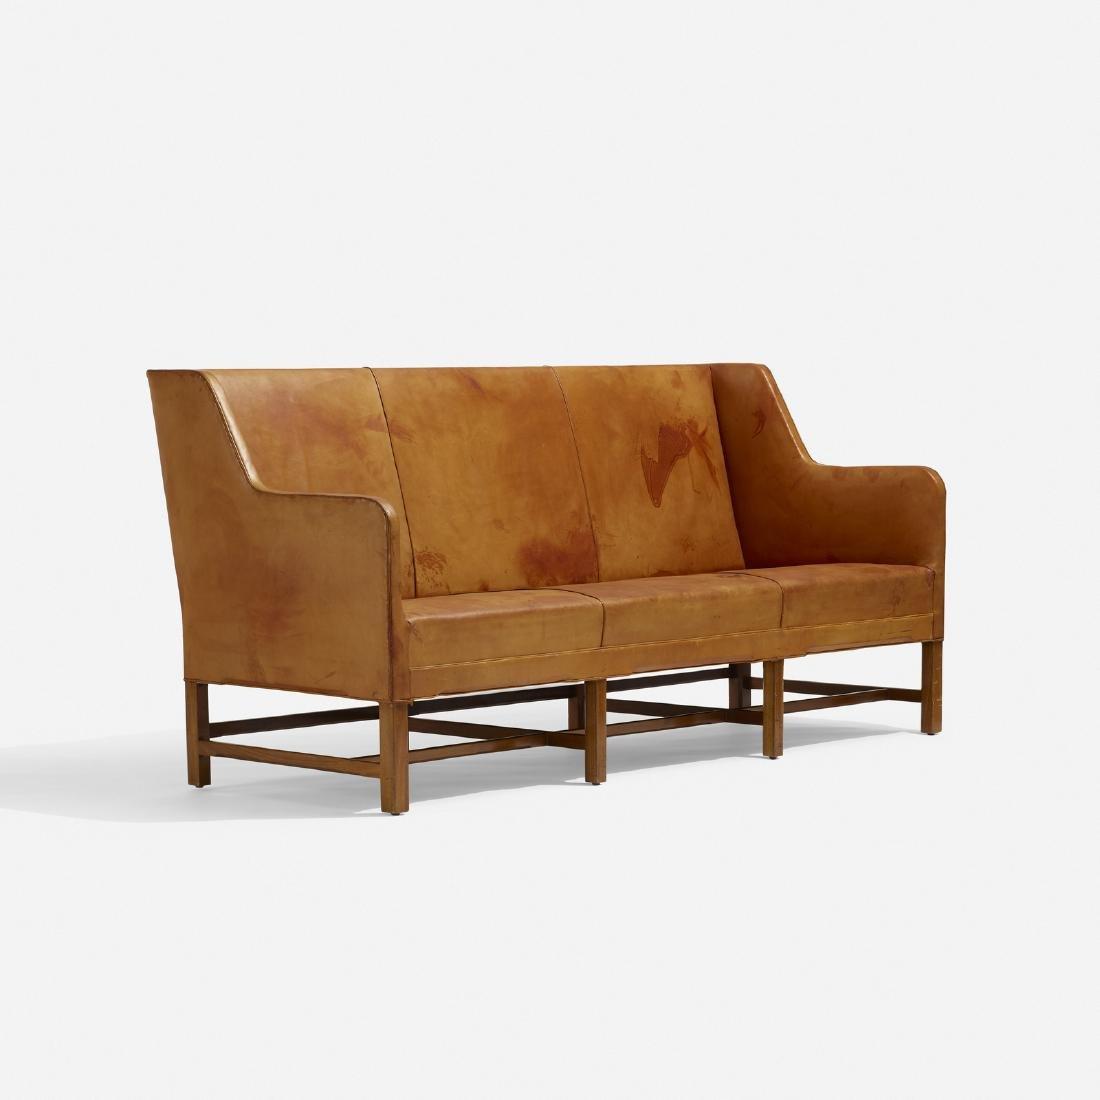 Kaare Klint, sofa, model 5011